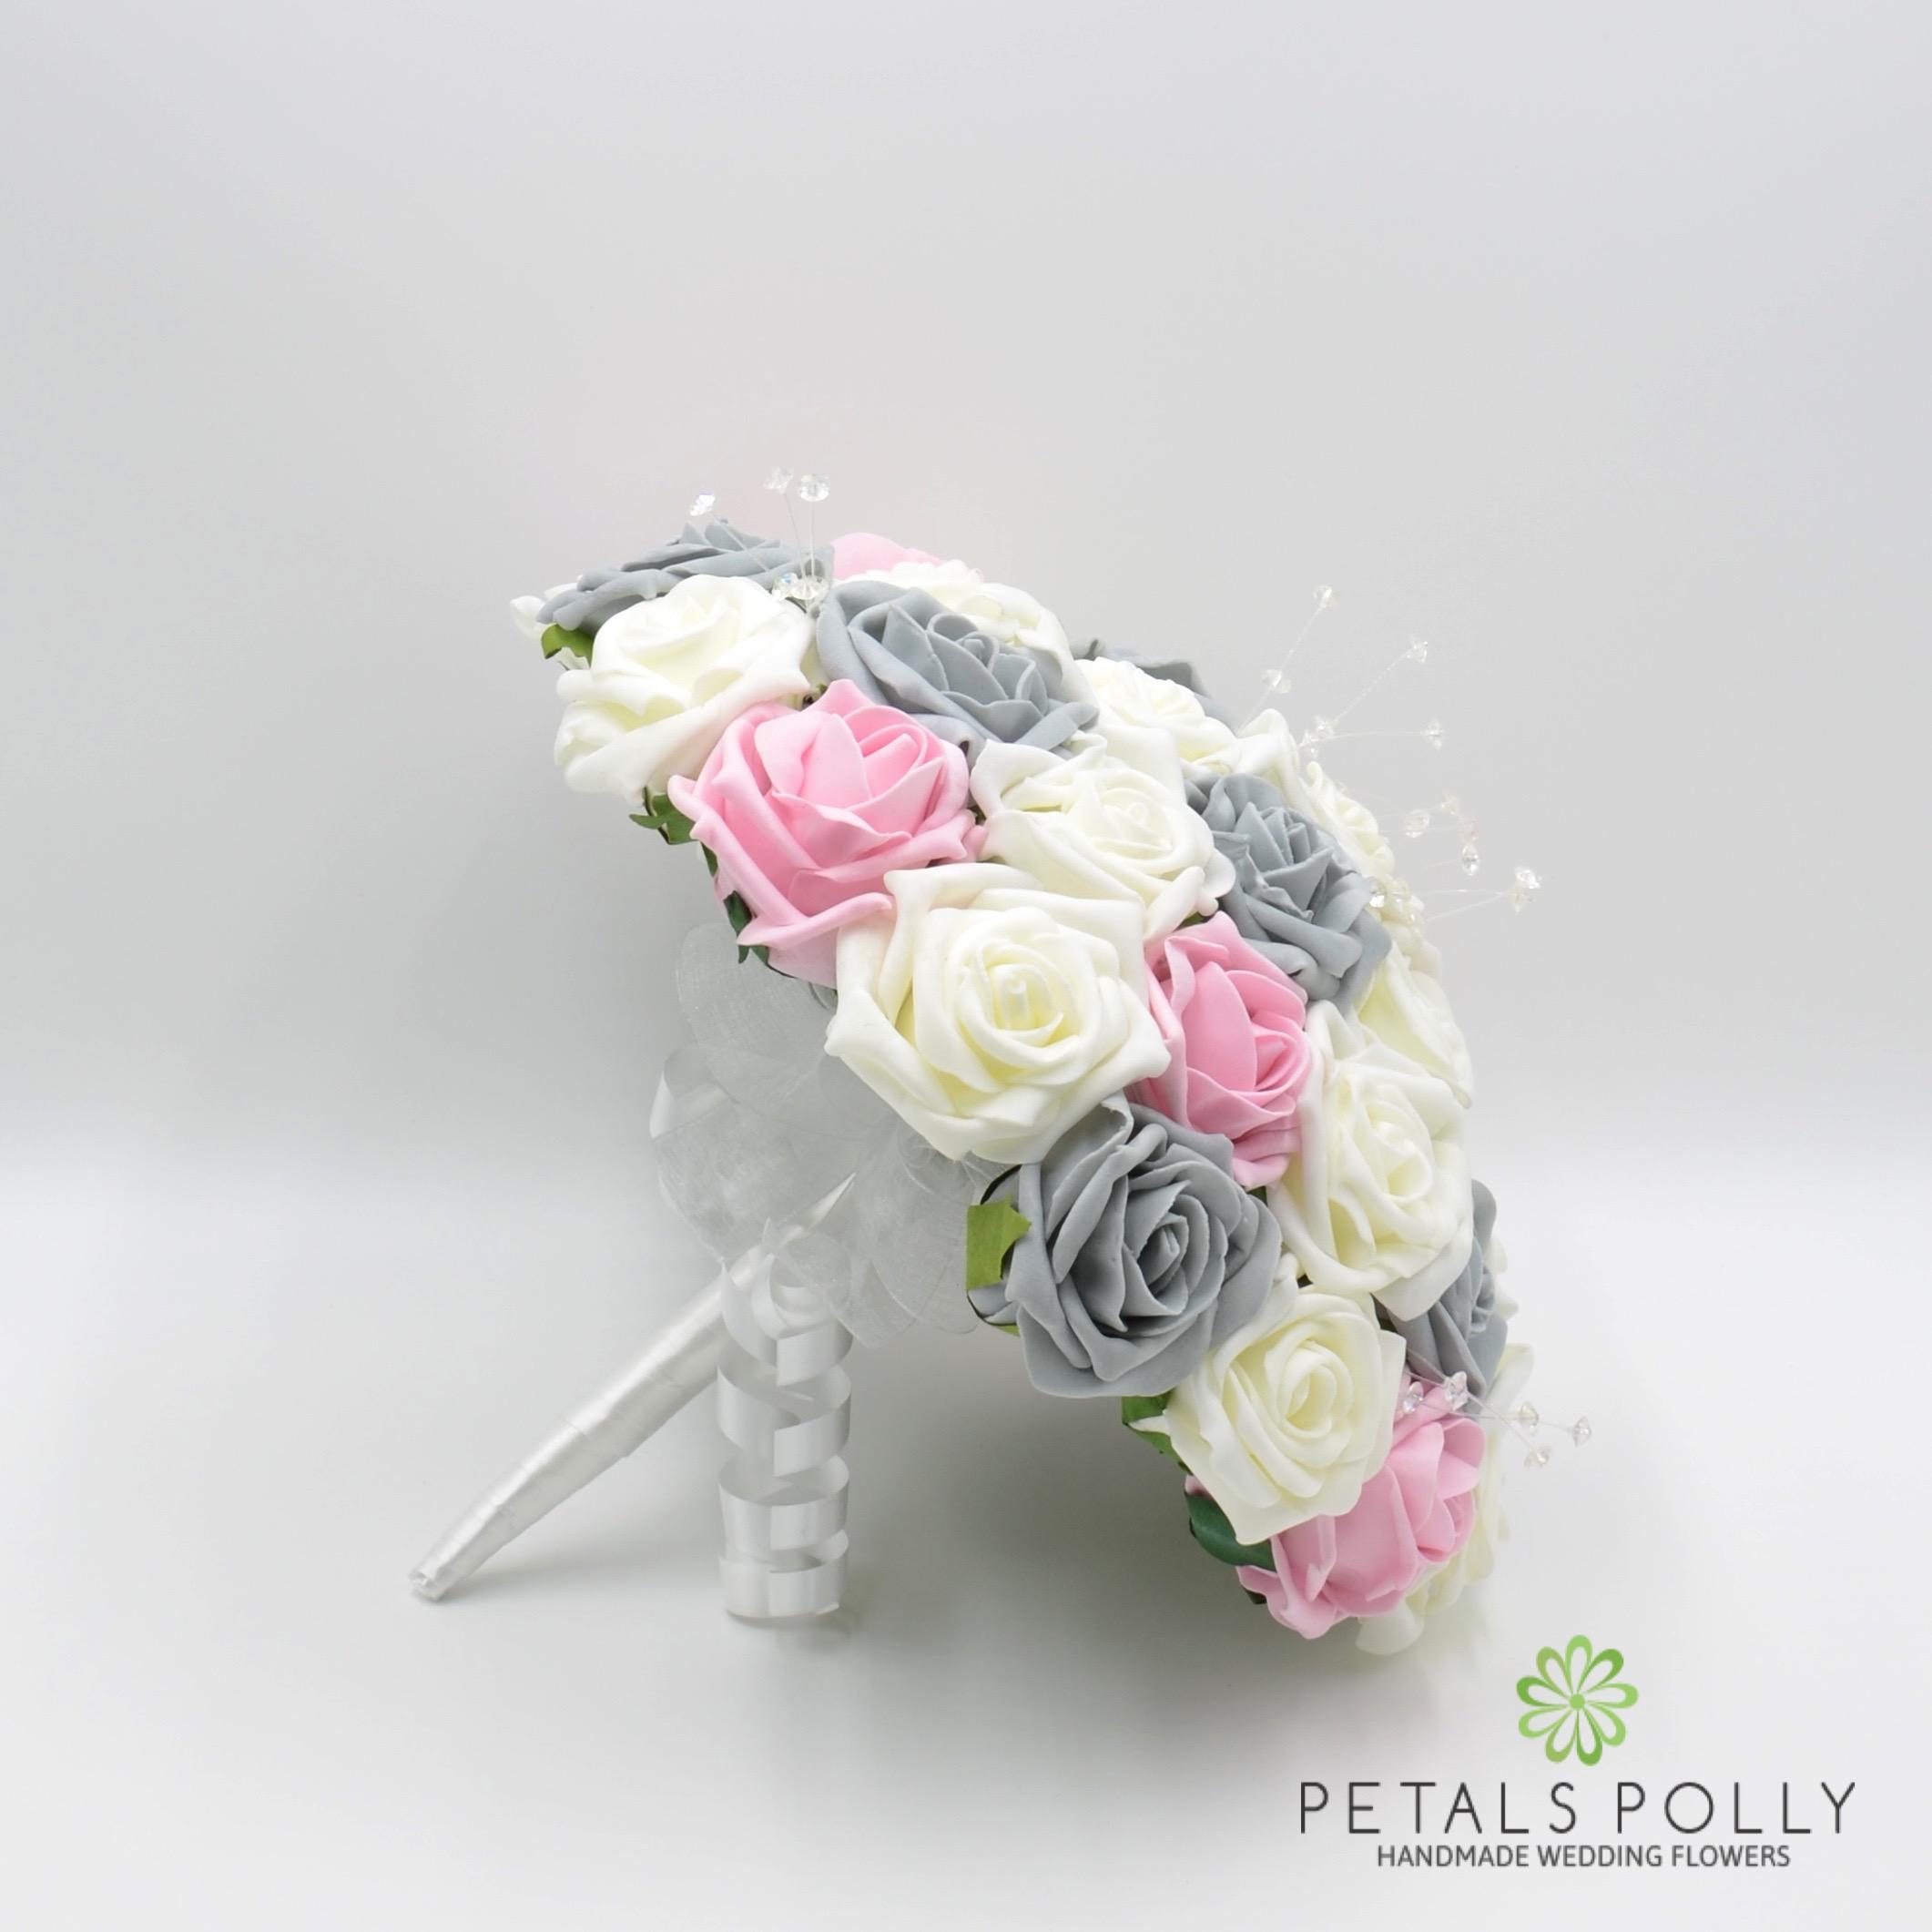 Grey baby pink ivory rose brides posy grey baby pink ivory rose brides posy mightylinksfo